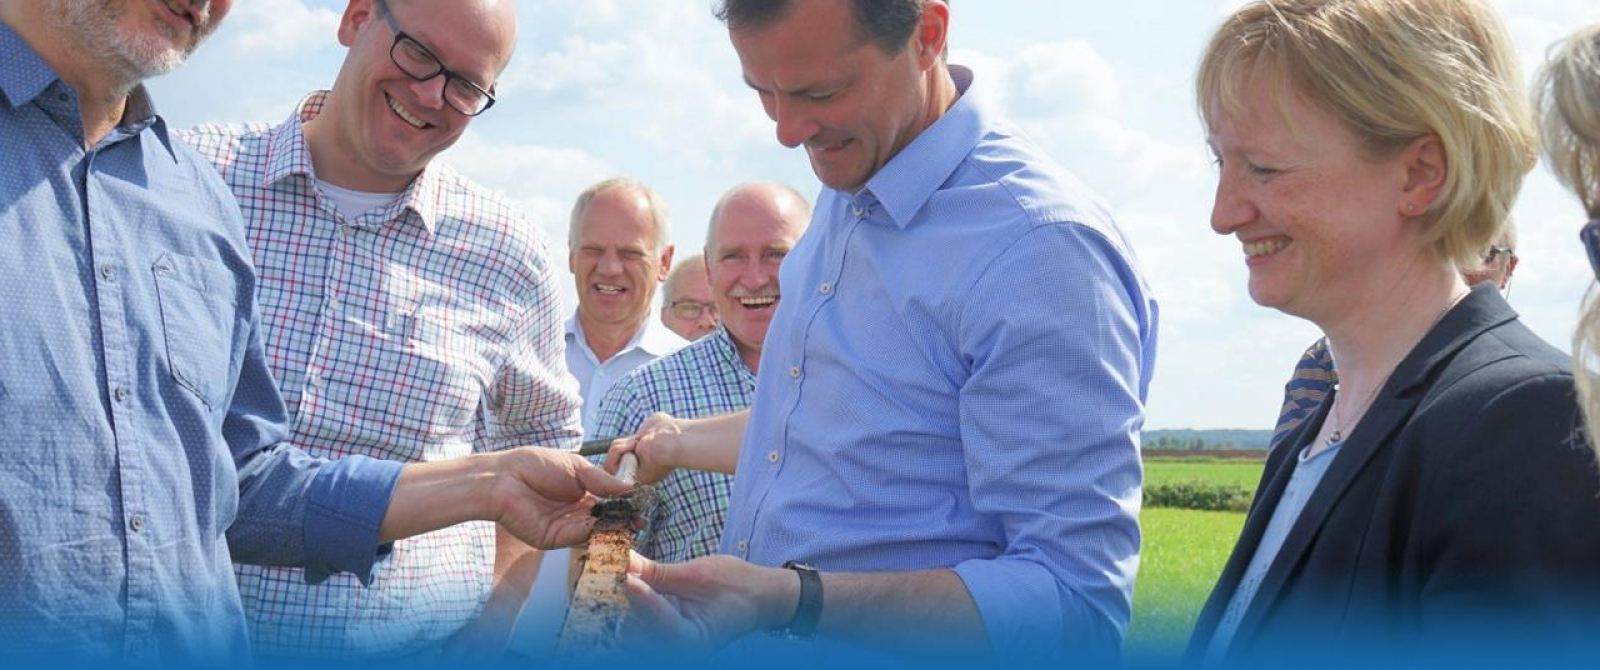 oliver-grundmann-stade-rotenburg-politiker-cdu-berlin-bundestag-mdb (64)